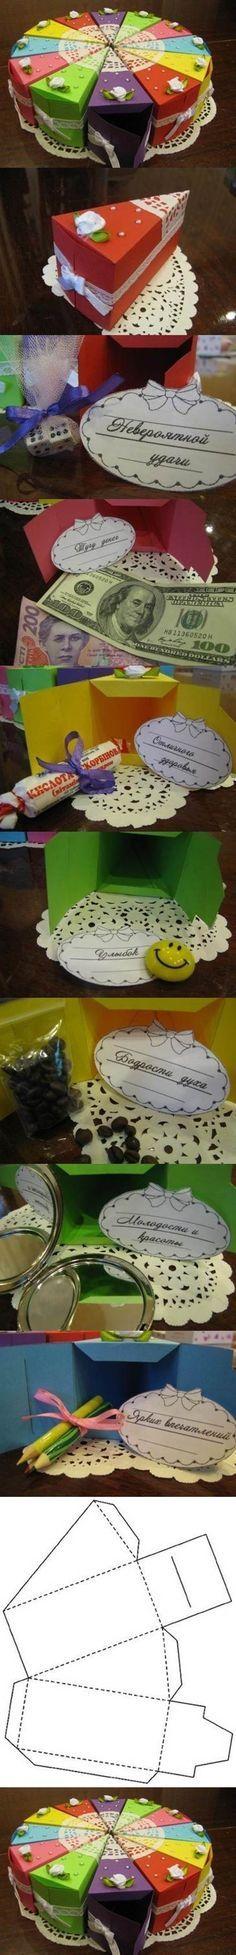 DIY Cake Shaped Gift Boxes   iCreativeIdeas.com Like Us on Facebook ==> https://www.facebook.com/icreativeideas